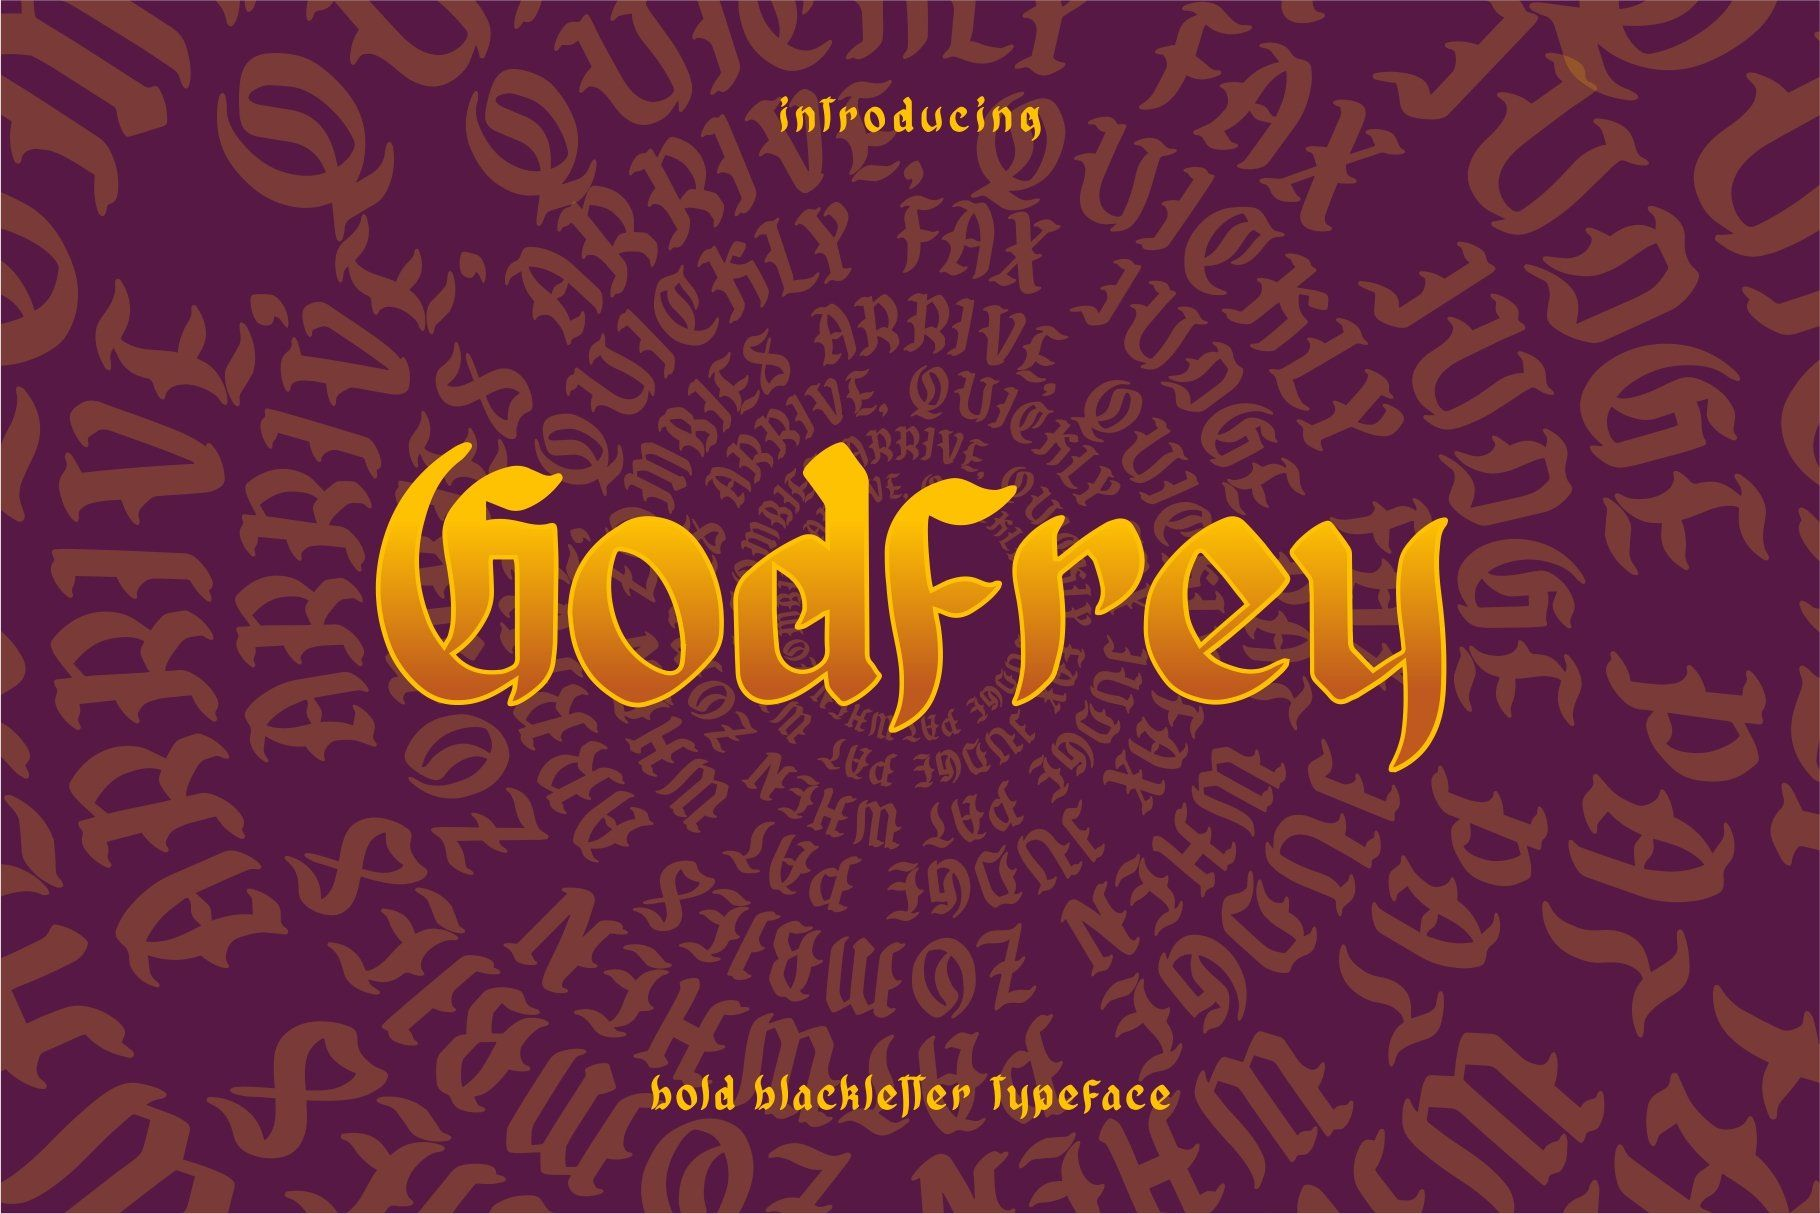 Godfrey bold blackletter new fonts pretty fonts poster